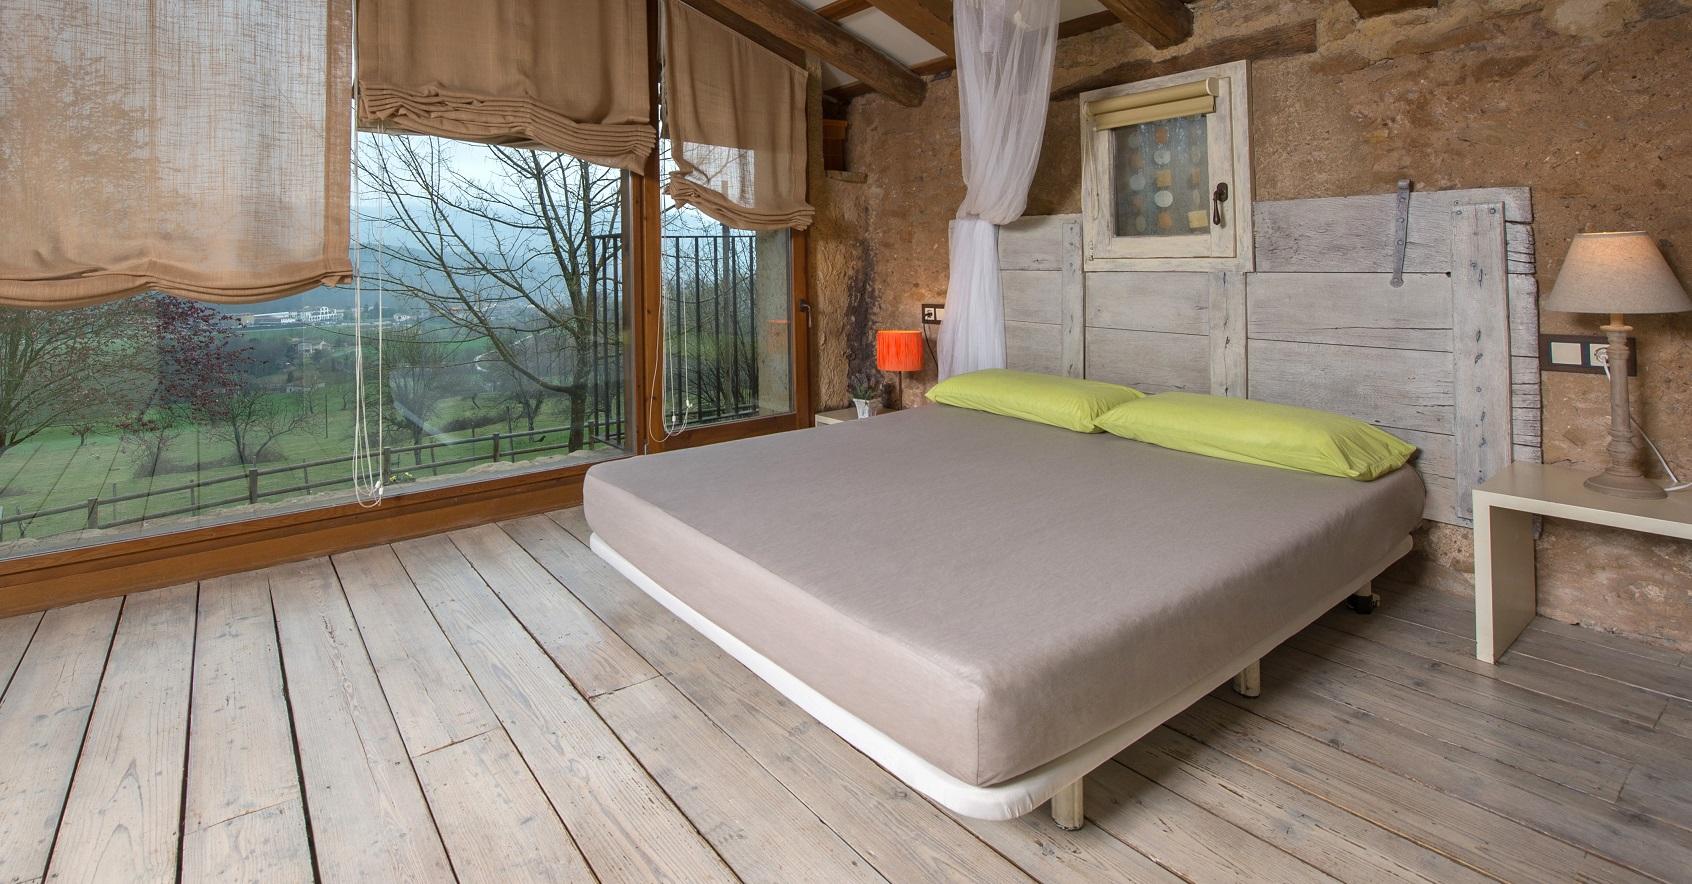 B Sensible Waterproof Bedding